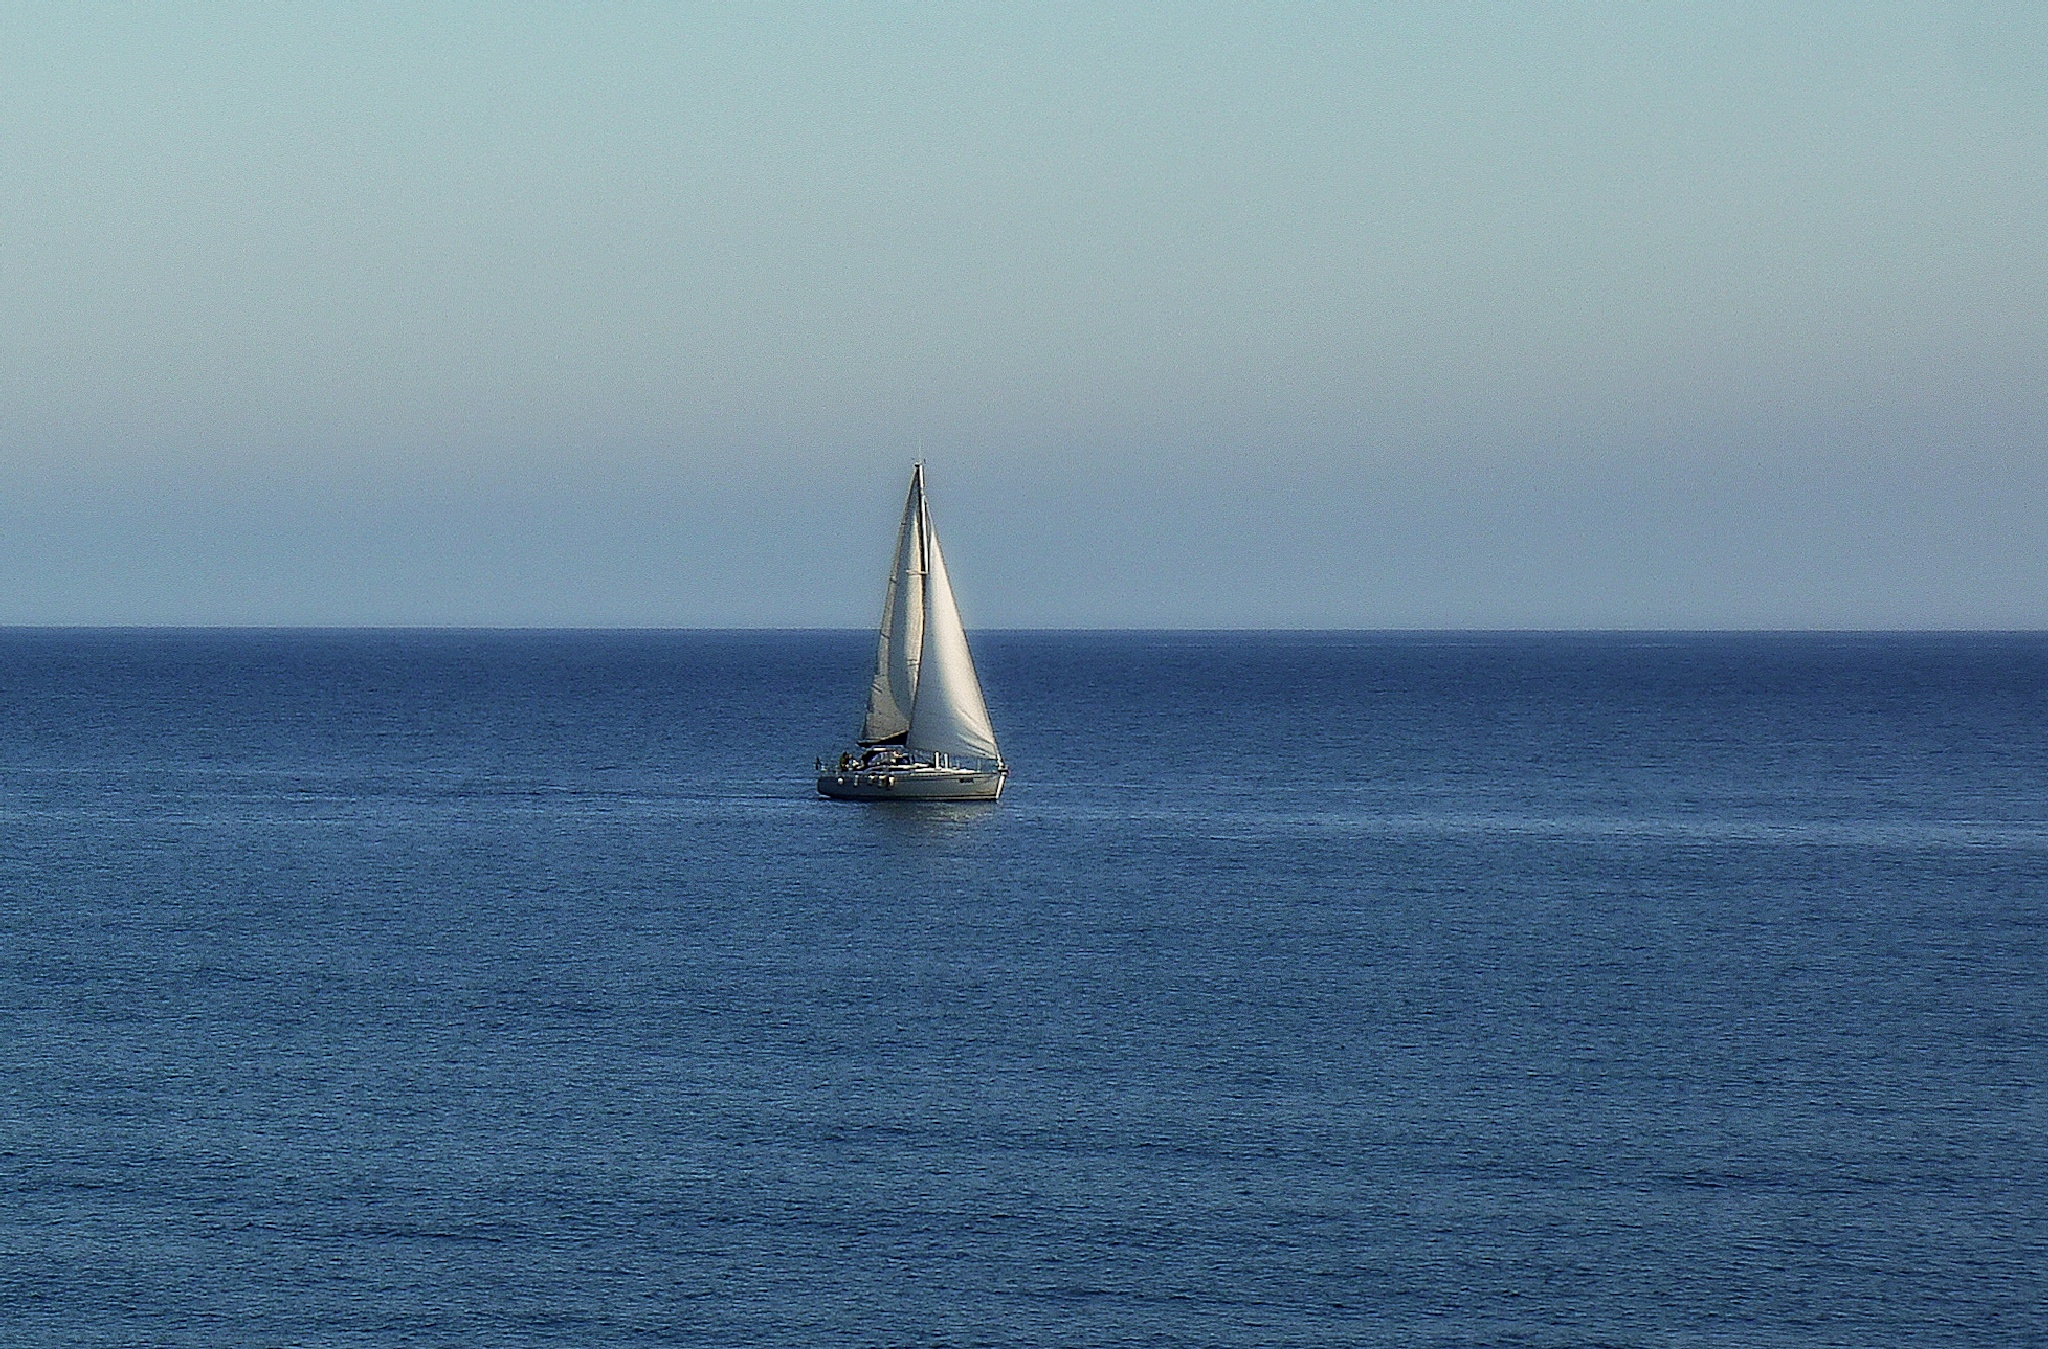 at sea by iuliacordeanu